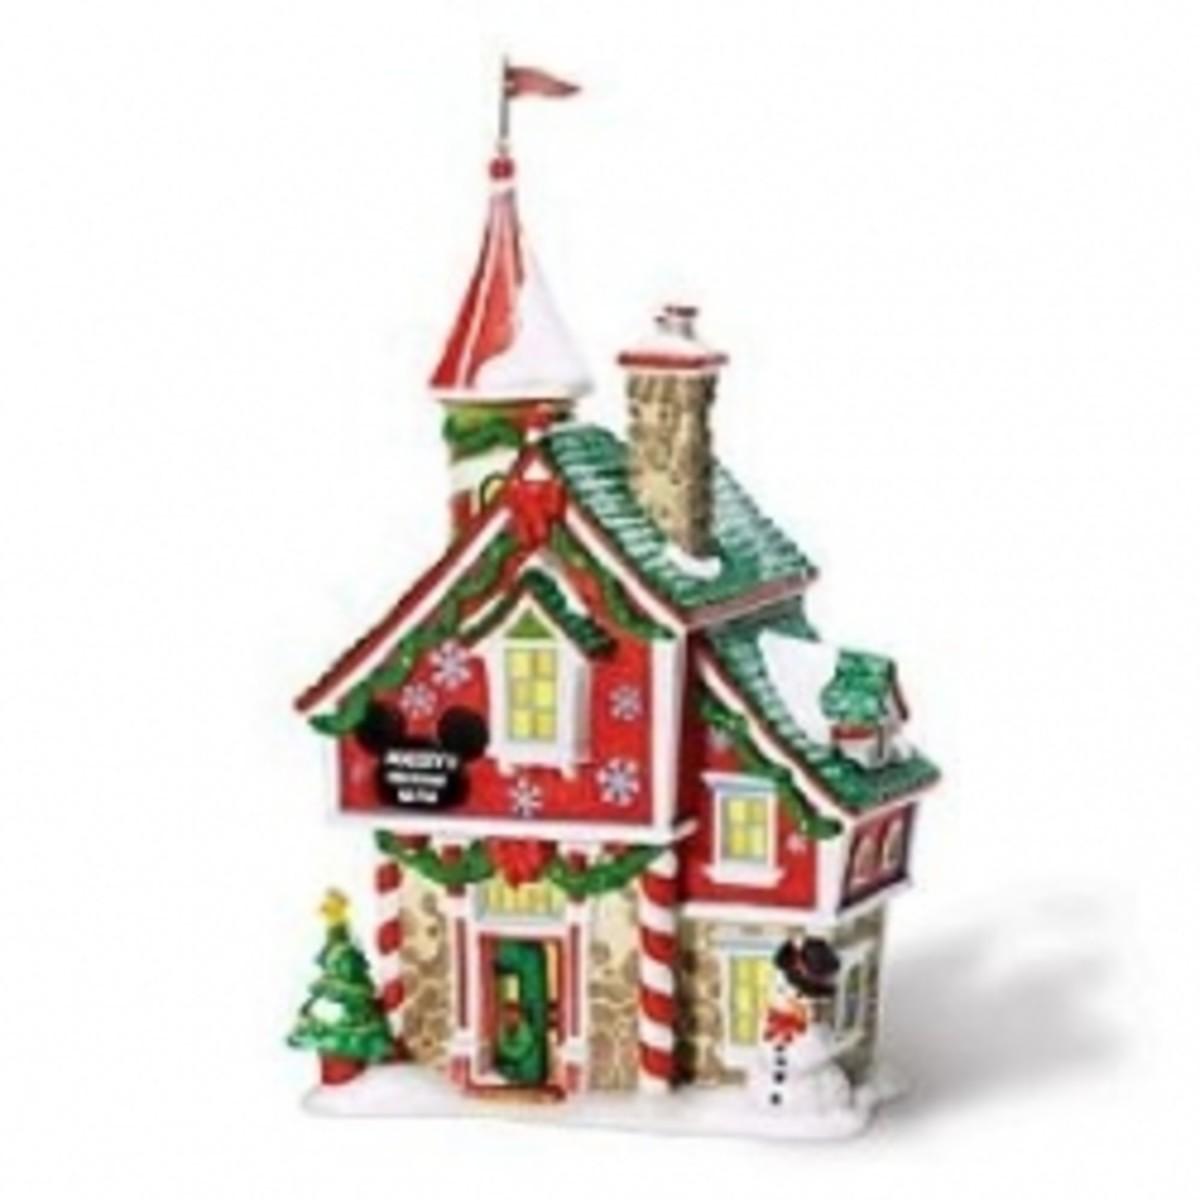 Build a Disney Christmas Village!